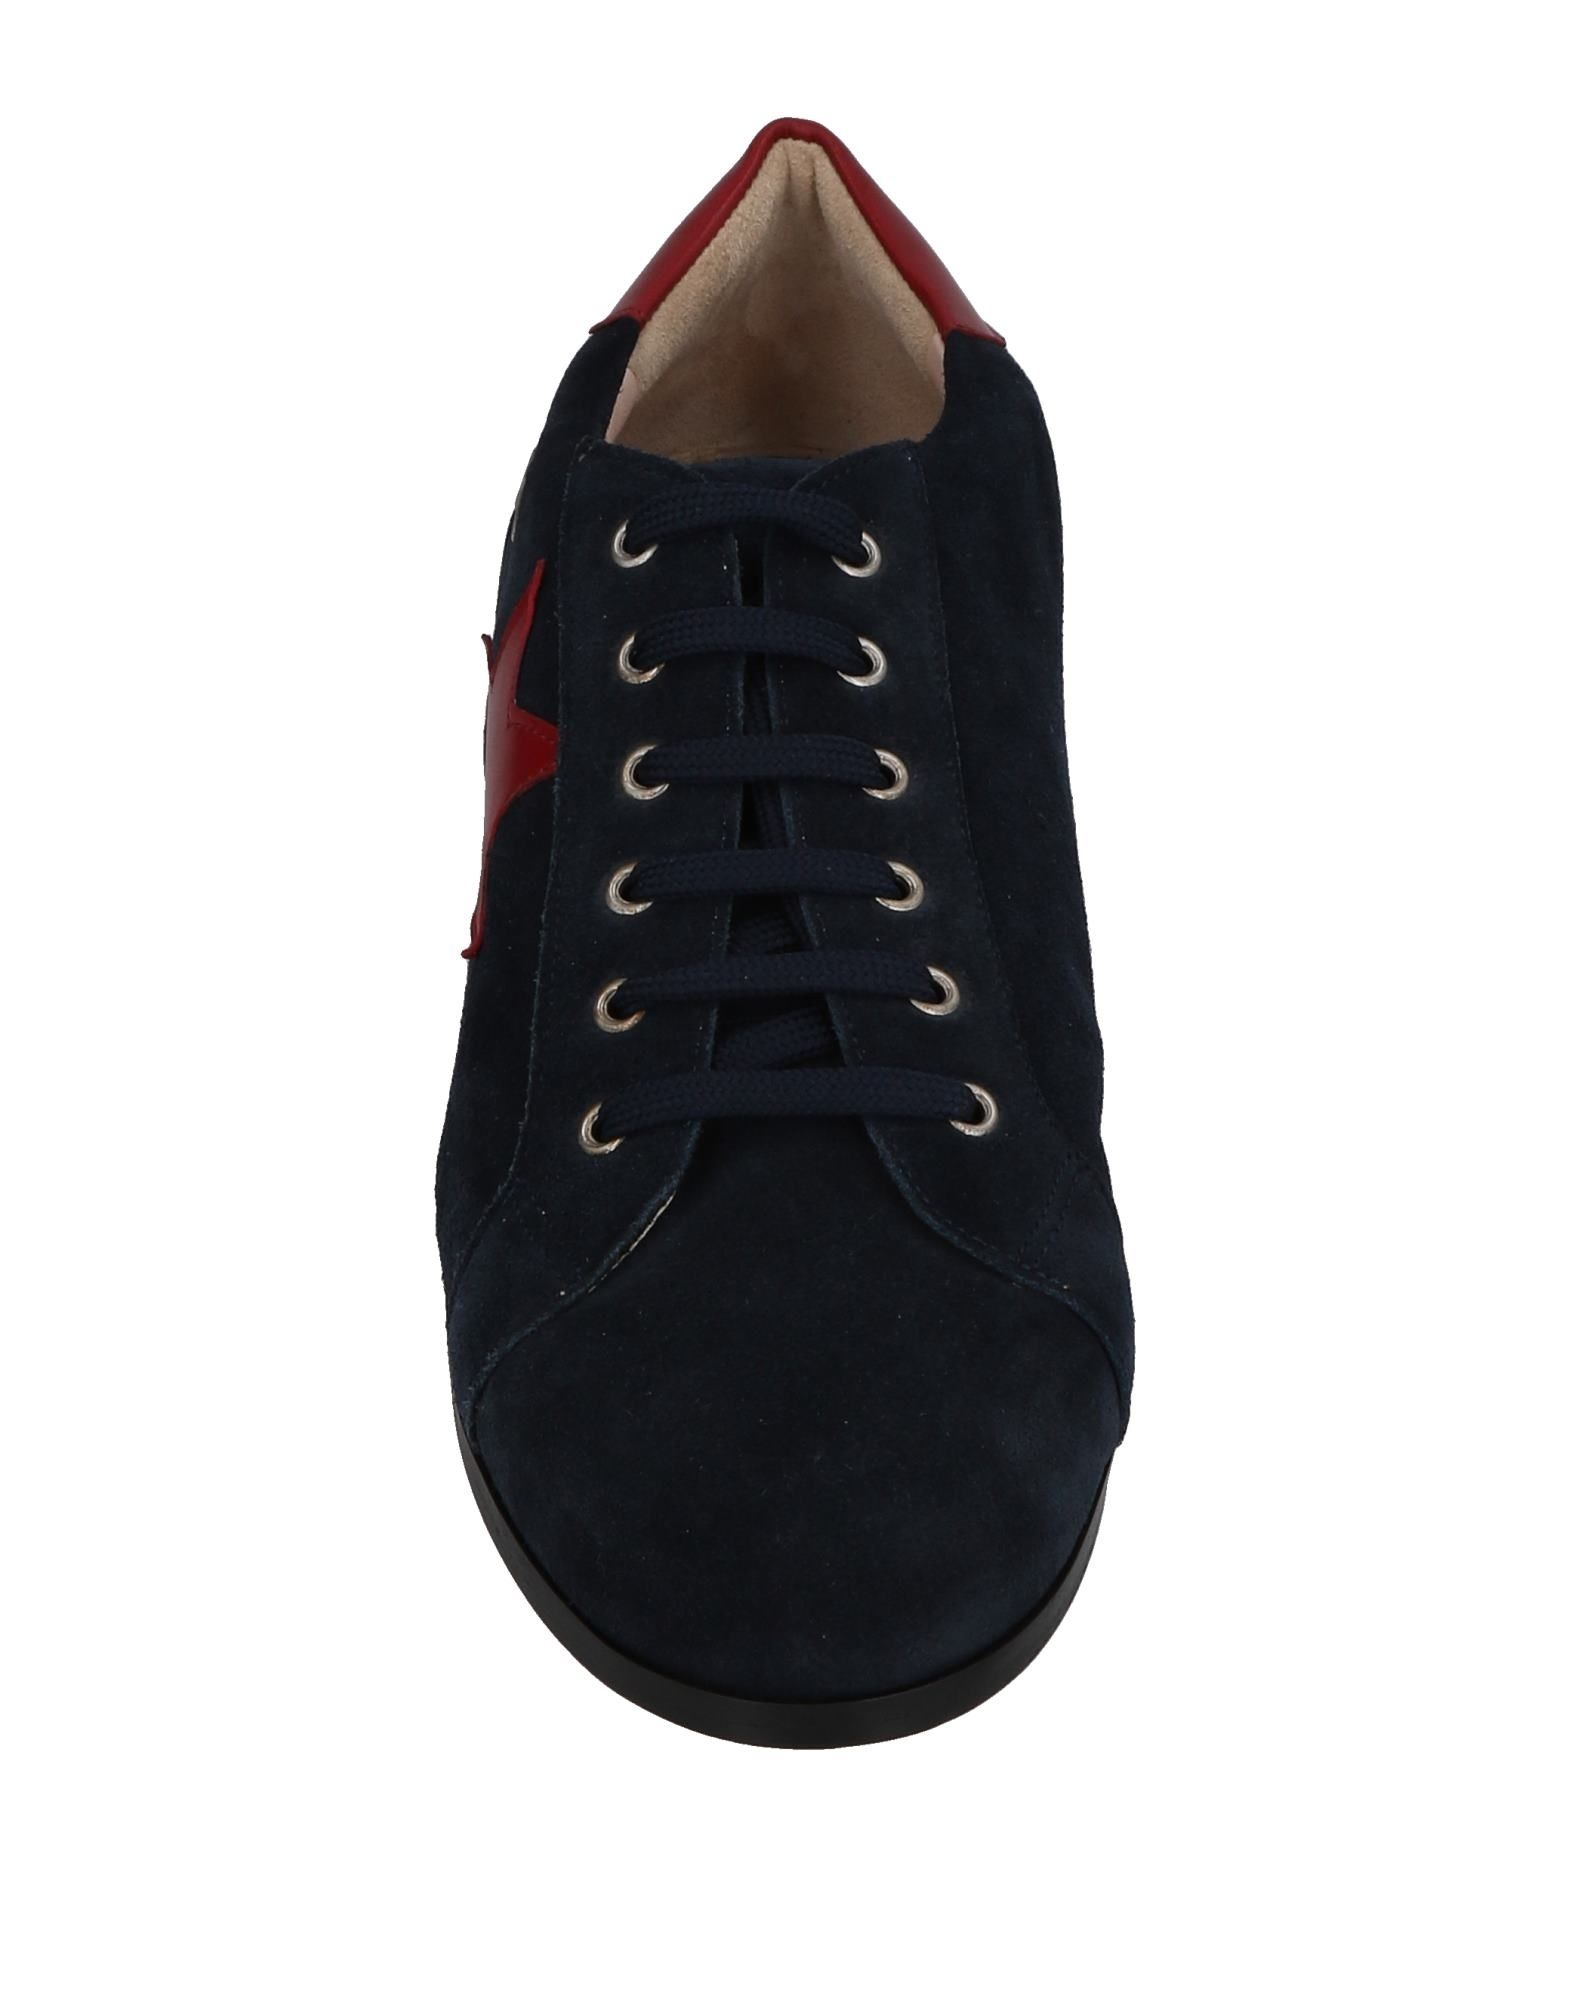 Cavallini Damen Schnürschuhe Damen Cavallini  11454393TT Gute Qualität beliebte Schuhe a981e1